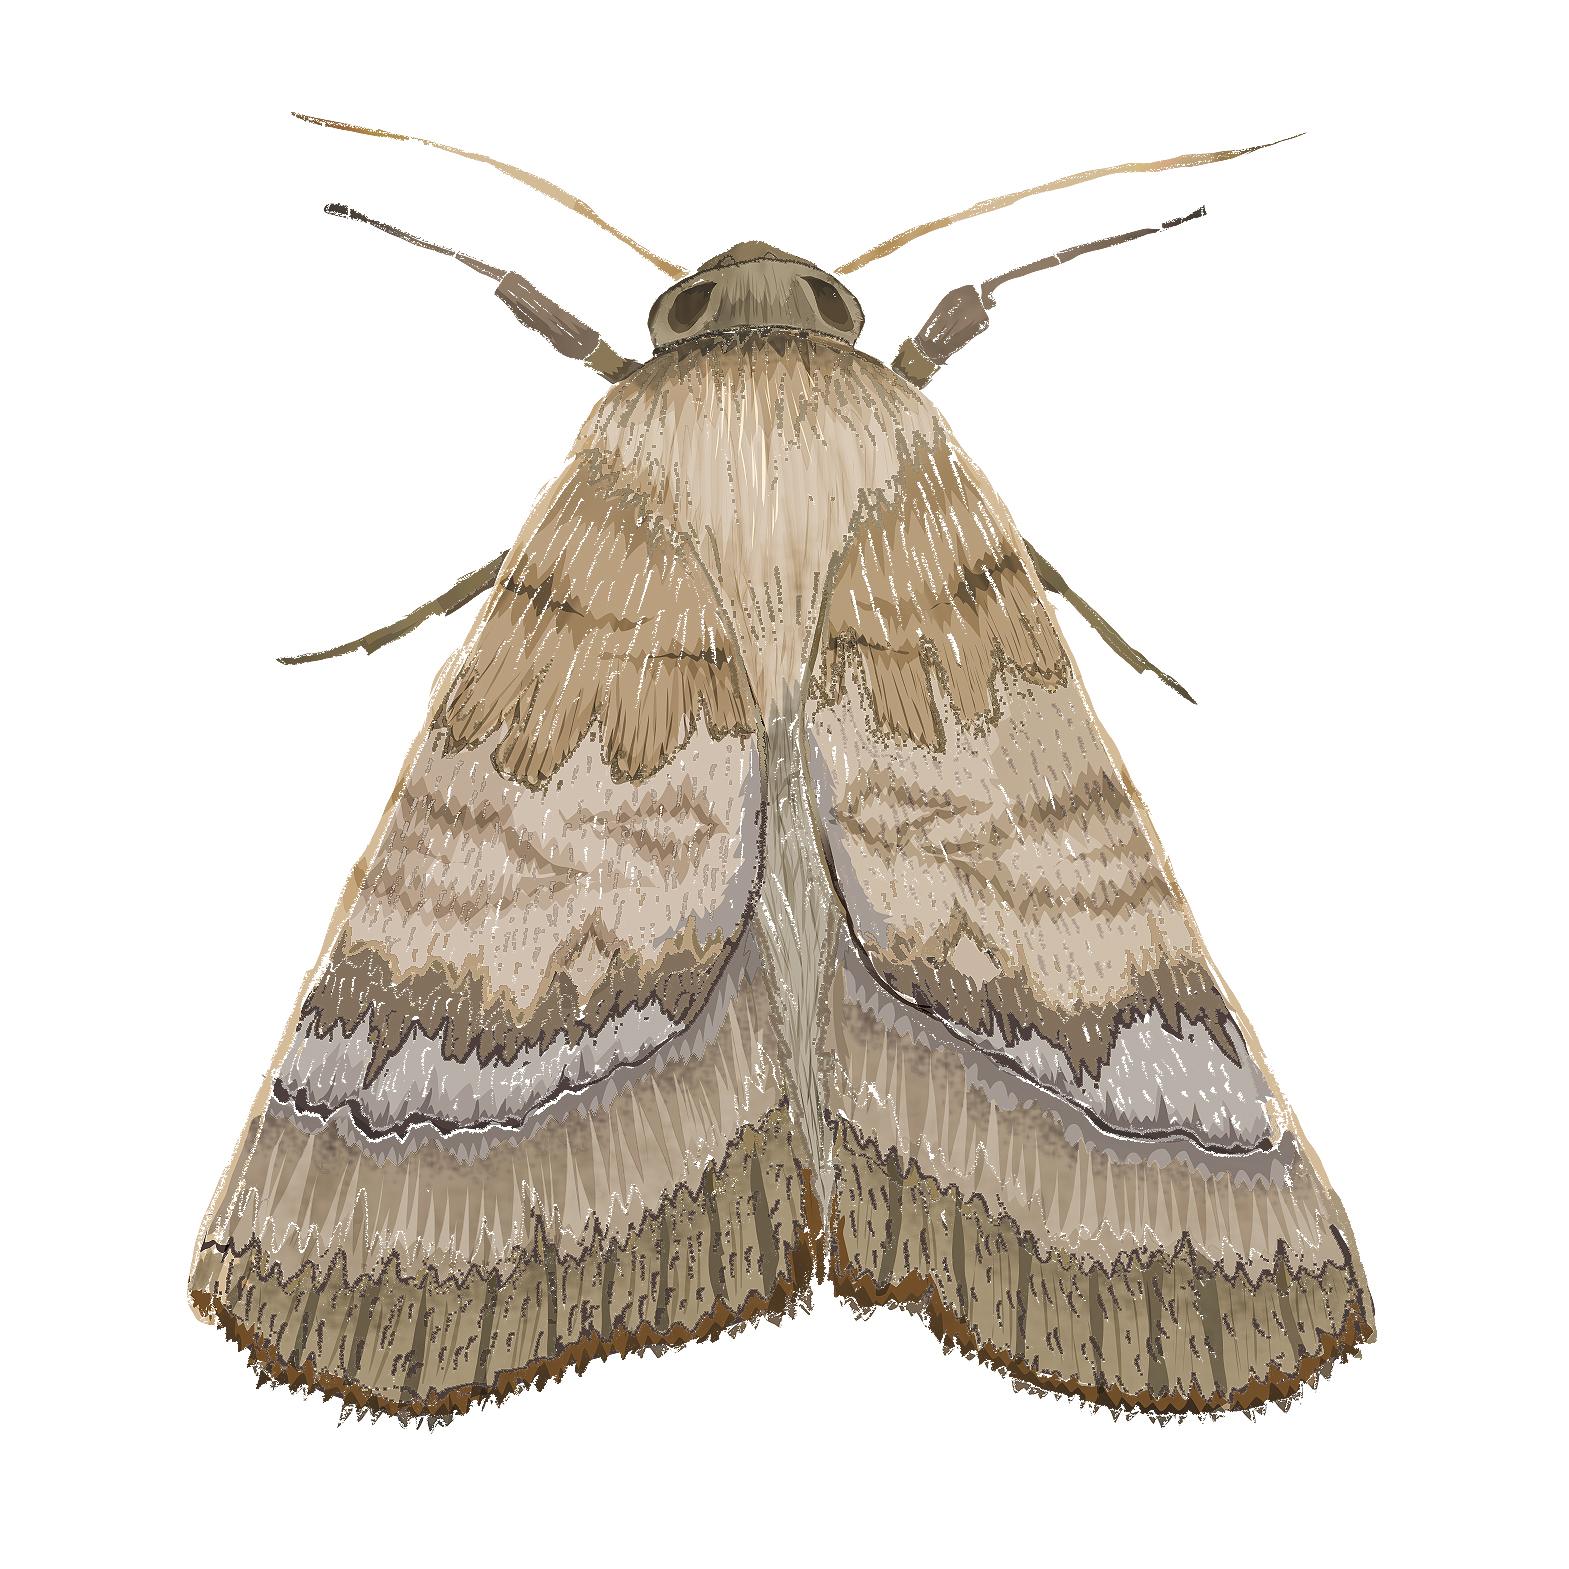 M - Moth